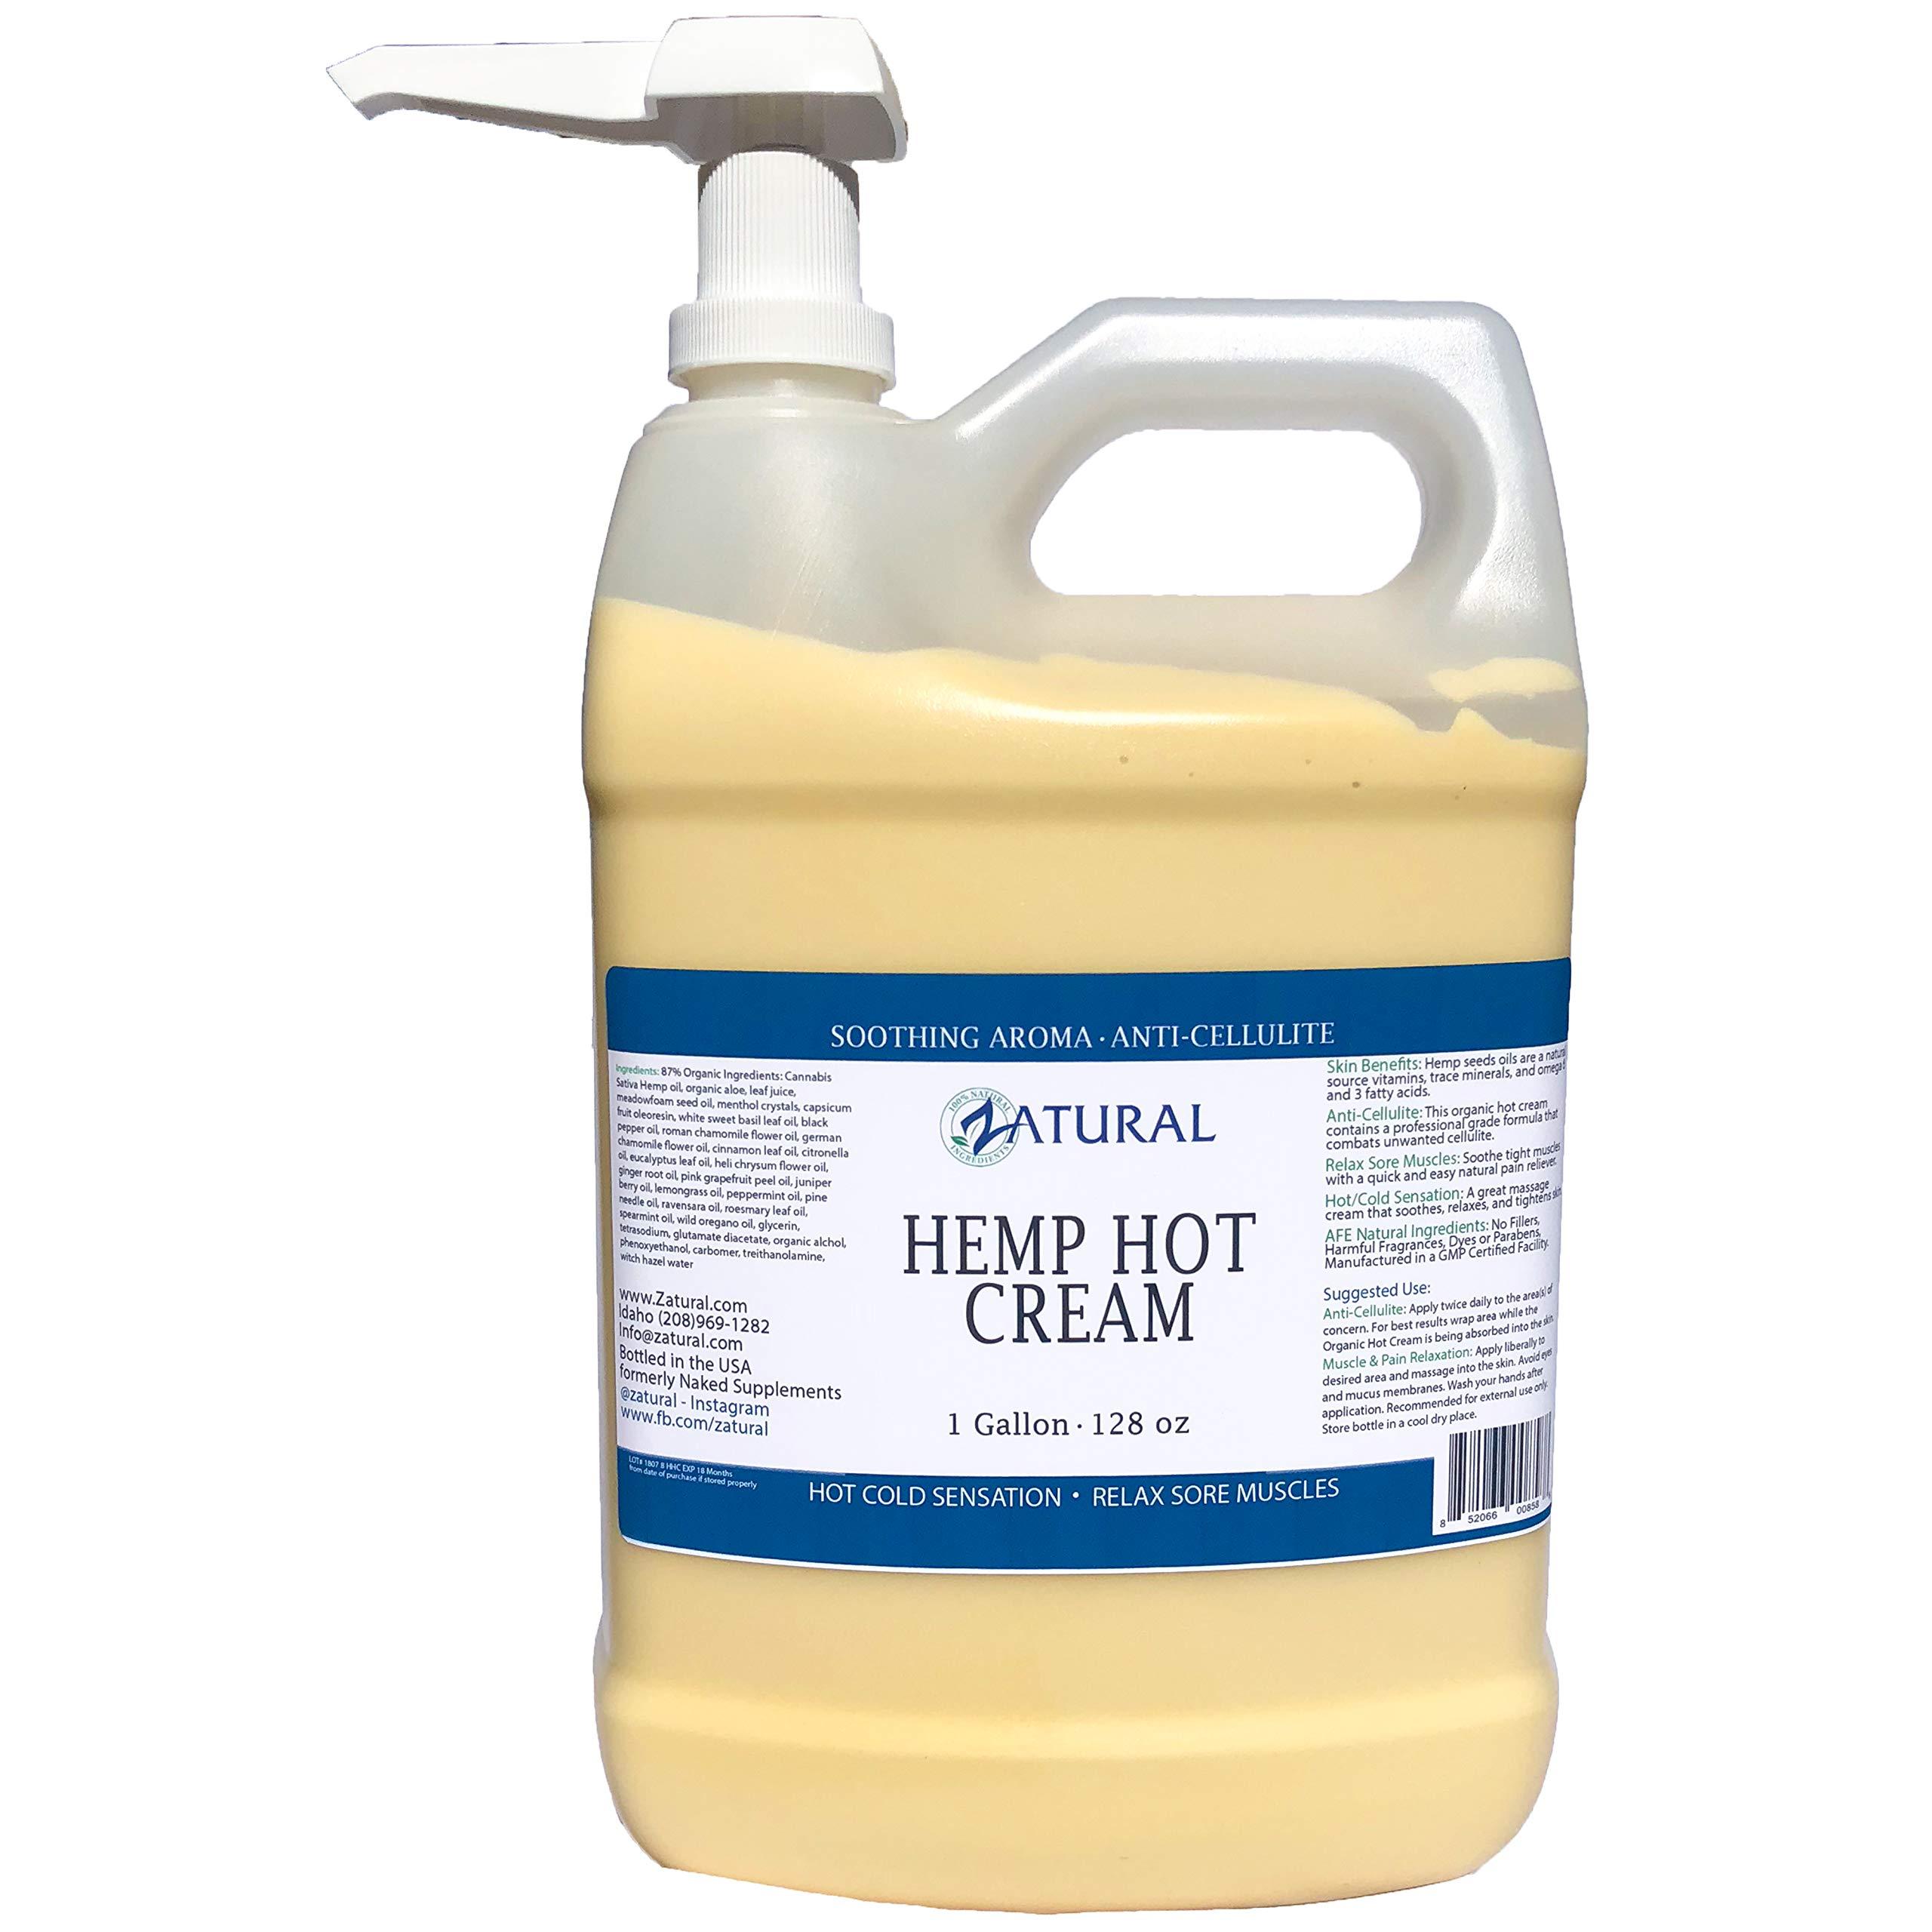 Hemp Hot Cream-Hemp Oil-Organic Hot Cream-Anti Cellulite-Muscle Cream-Pain Support (1 Gallon)